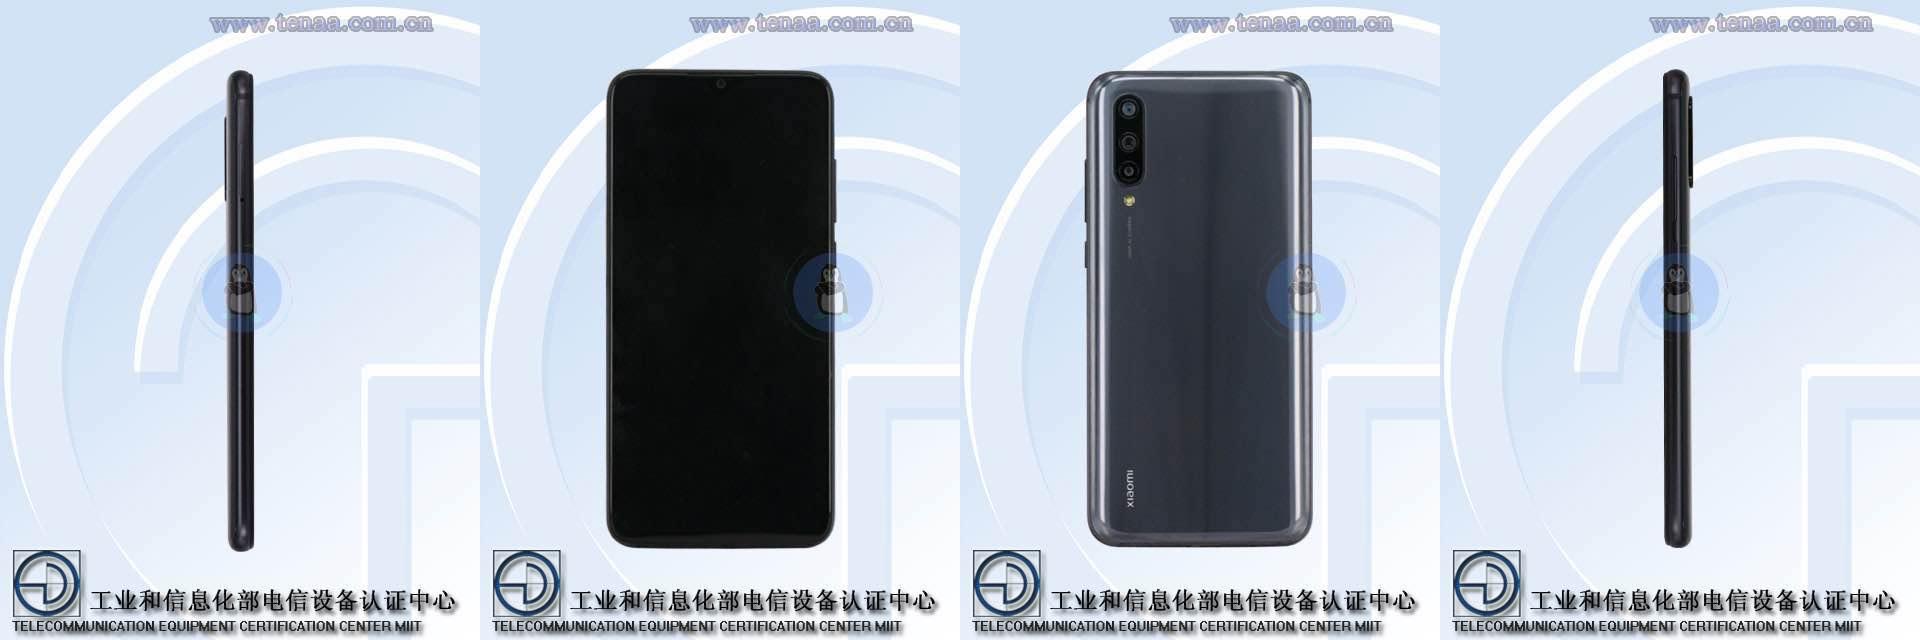 Xiaomi CC9 таCC9e помітили на рендерах